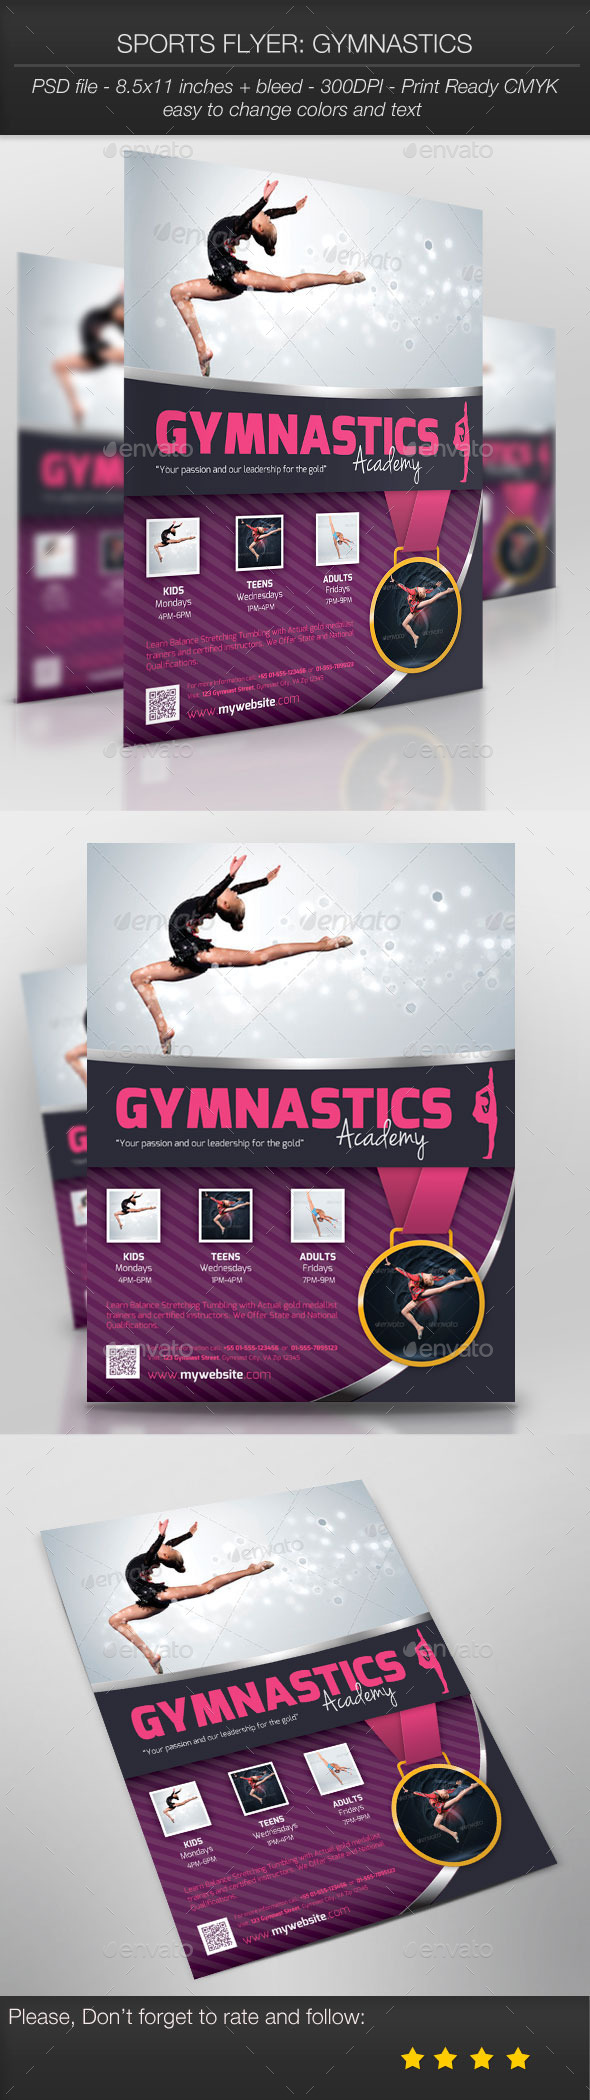 GraphicRiver Sports Flyer Gymnastics 9916016